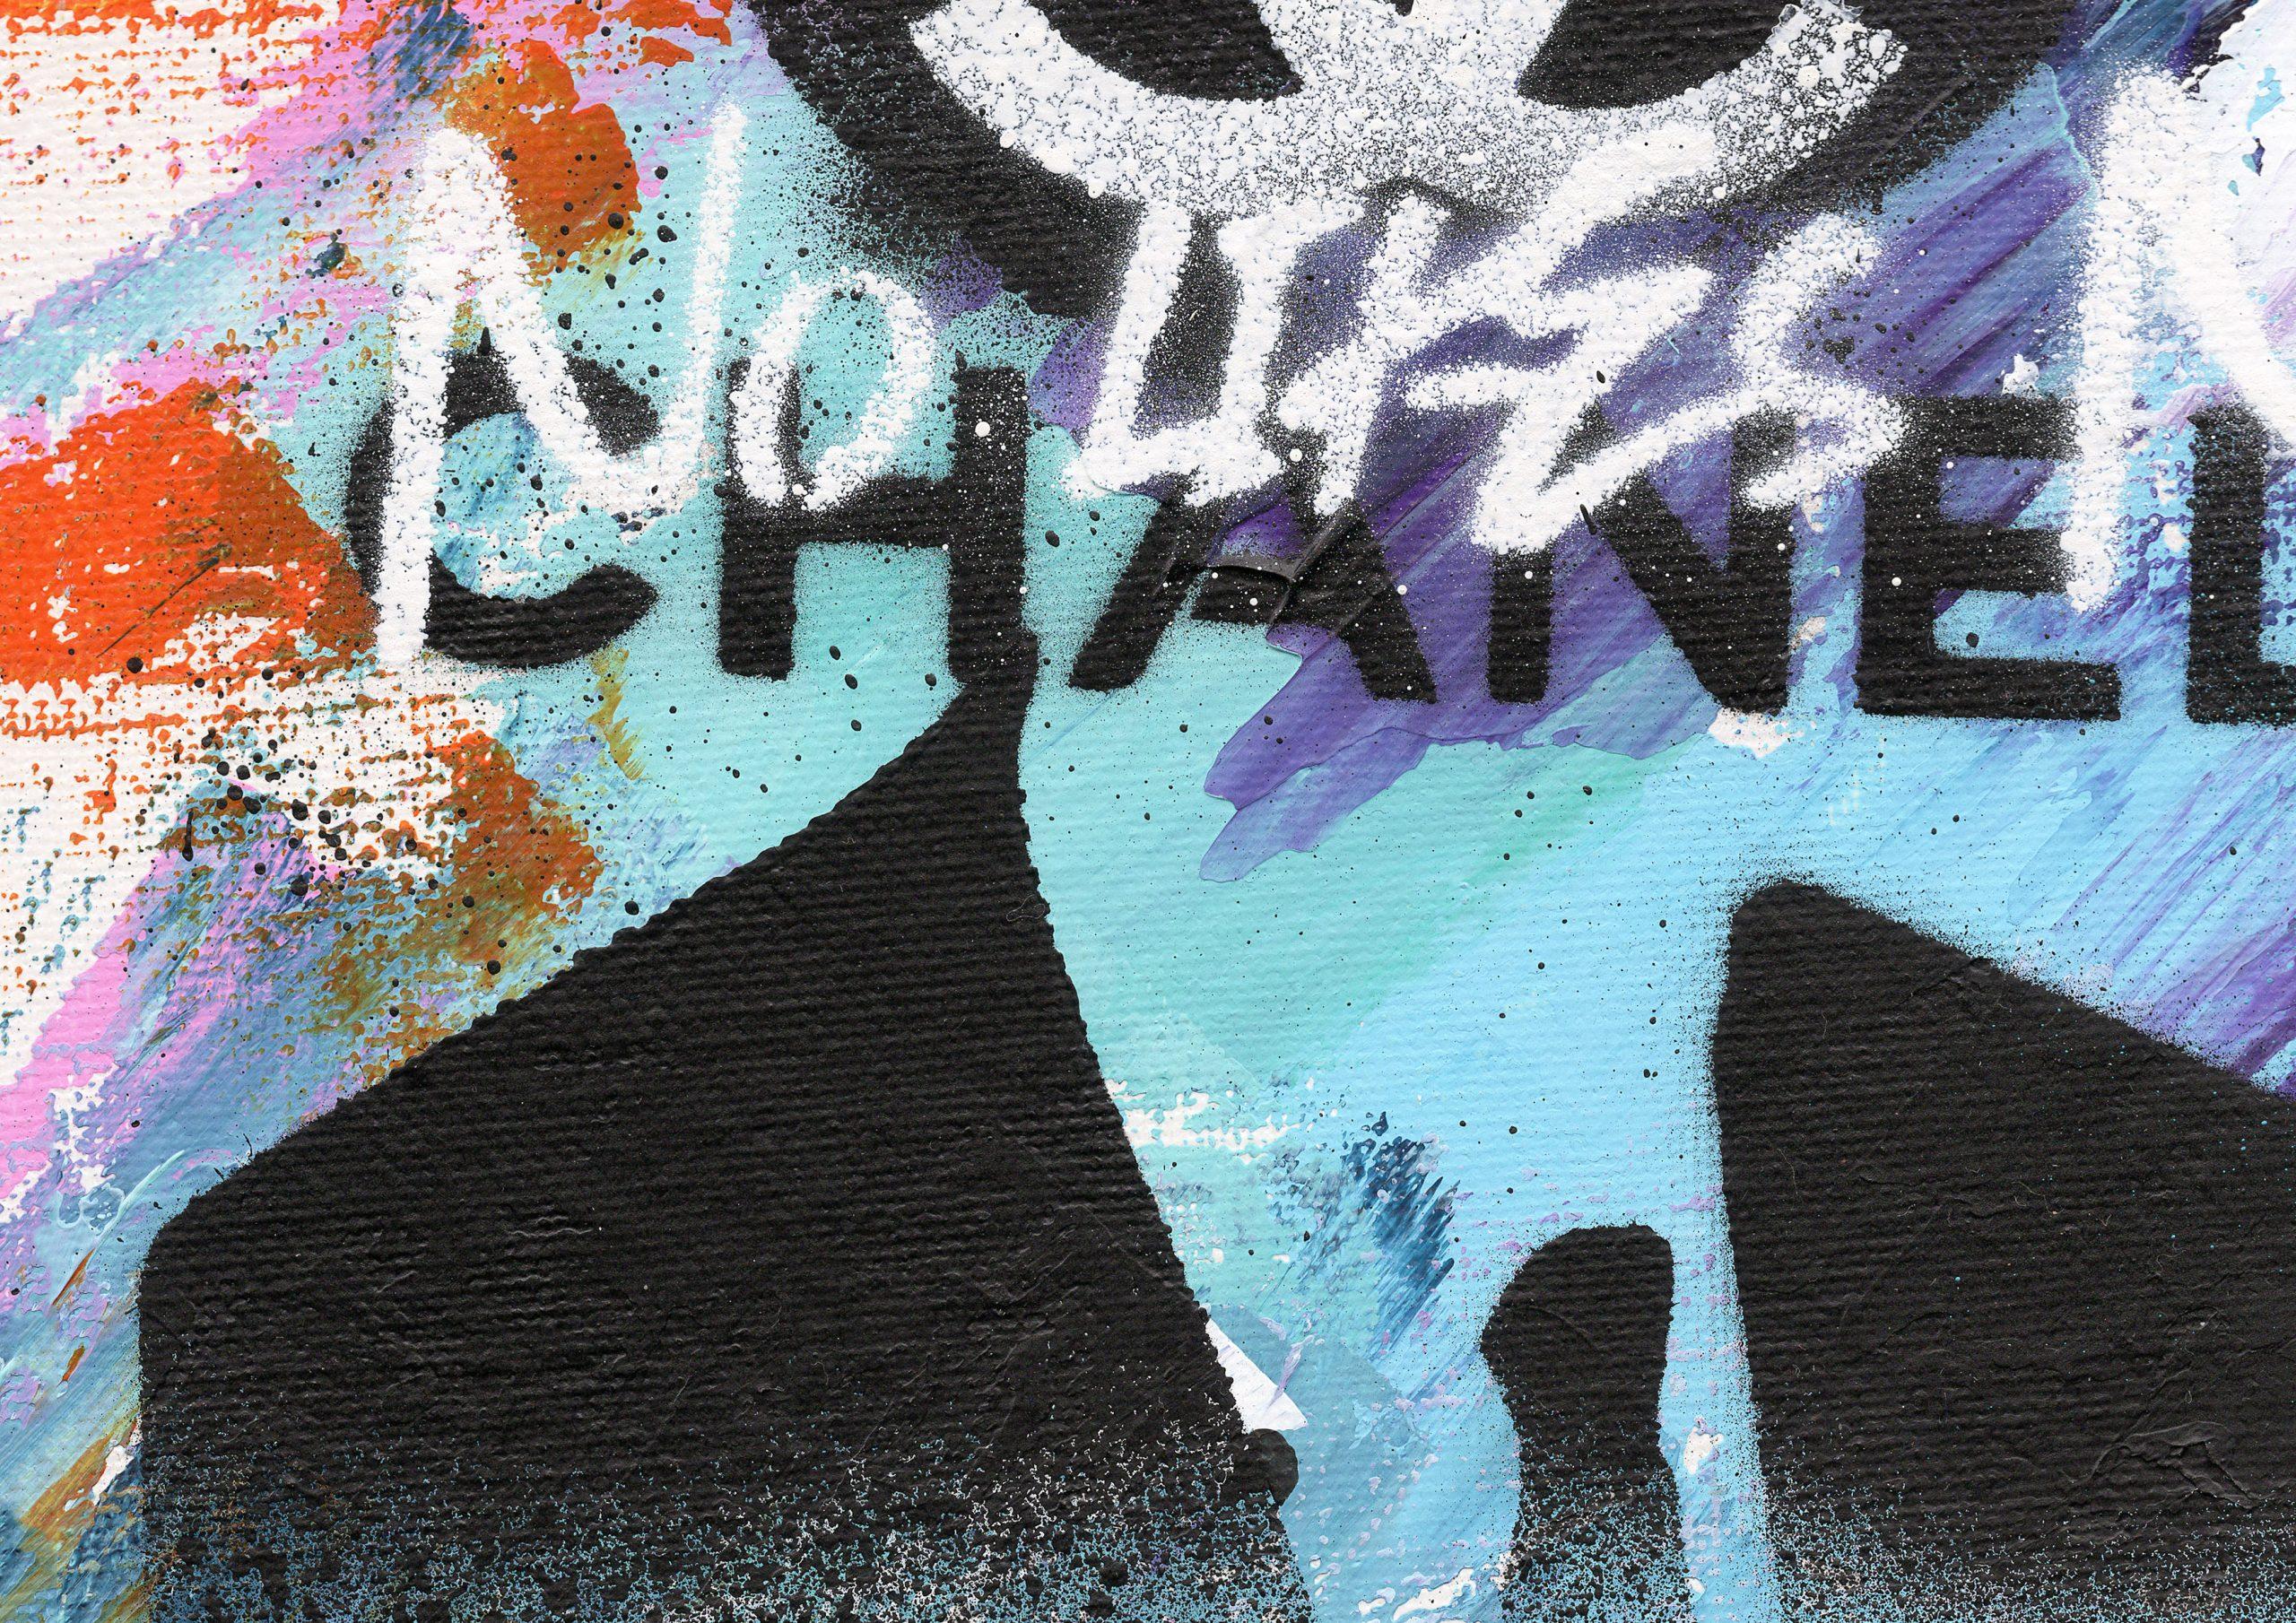 NATALIE-OTALORA-ART-NO-LIKES-NO-CHANEL-GRAFFITI-PAINTING-DETAIL3.JPG